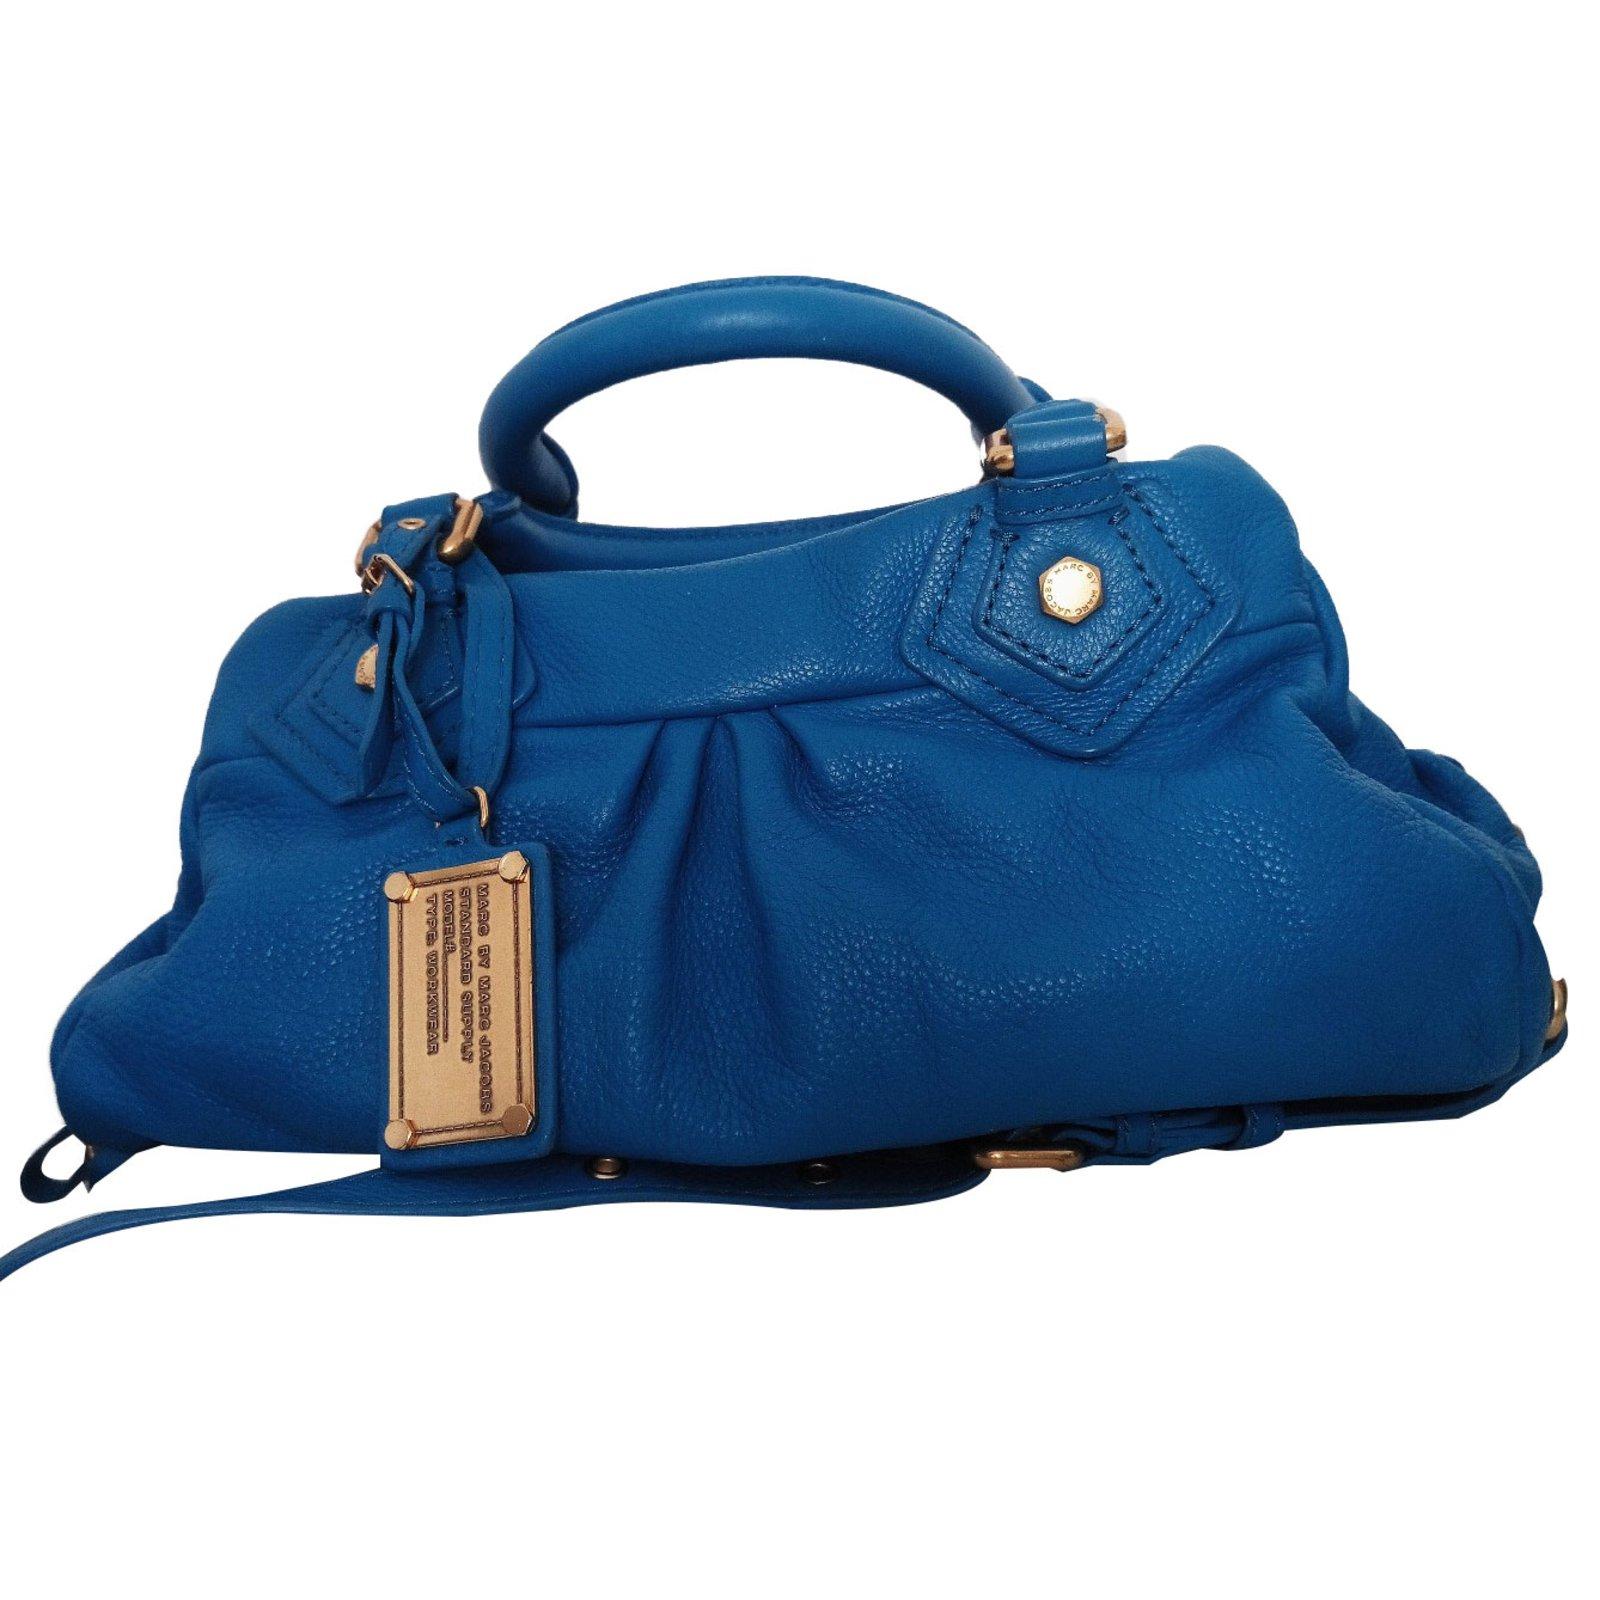 1eb5b21e16d Marc by Marc Jacobs Baby Groove classique Q Handbags Leather Blue,Golden  ref.65196